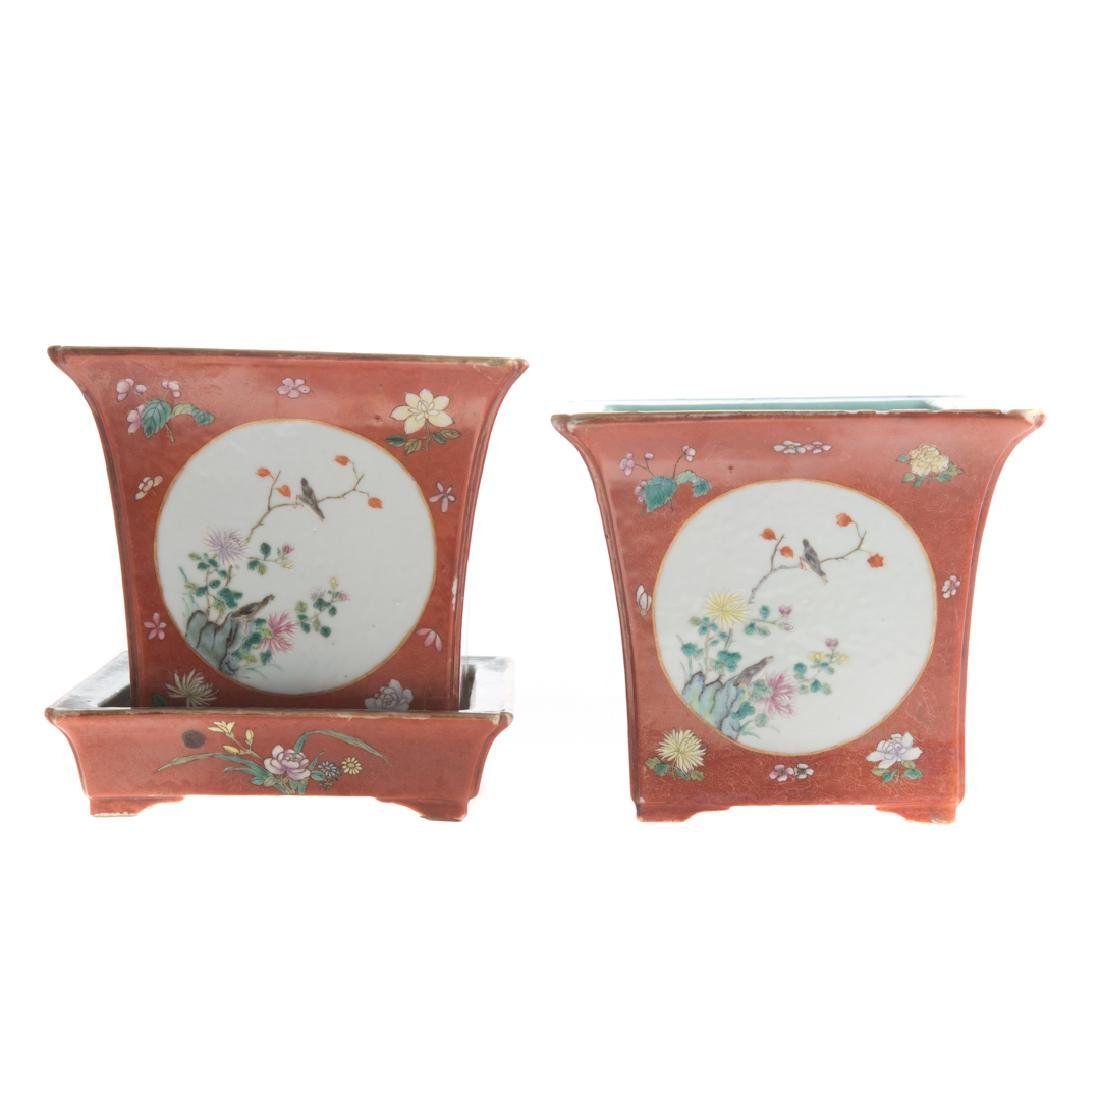 Pair Chinese porcelain jardinieres